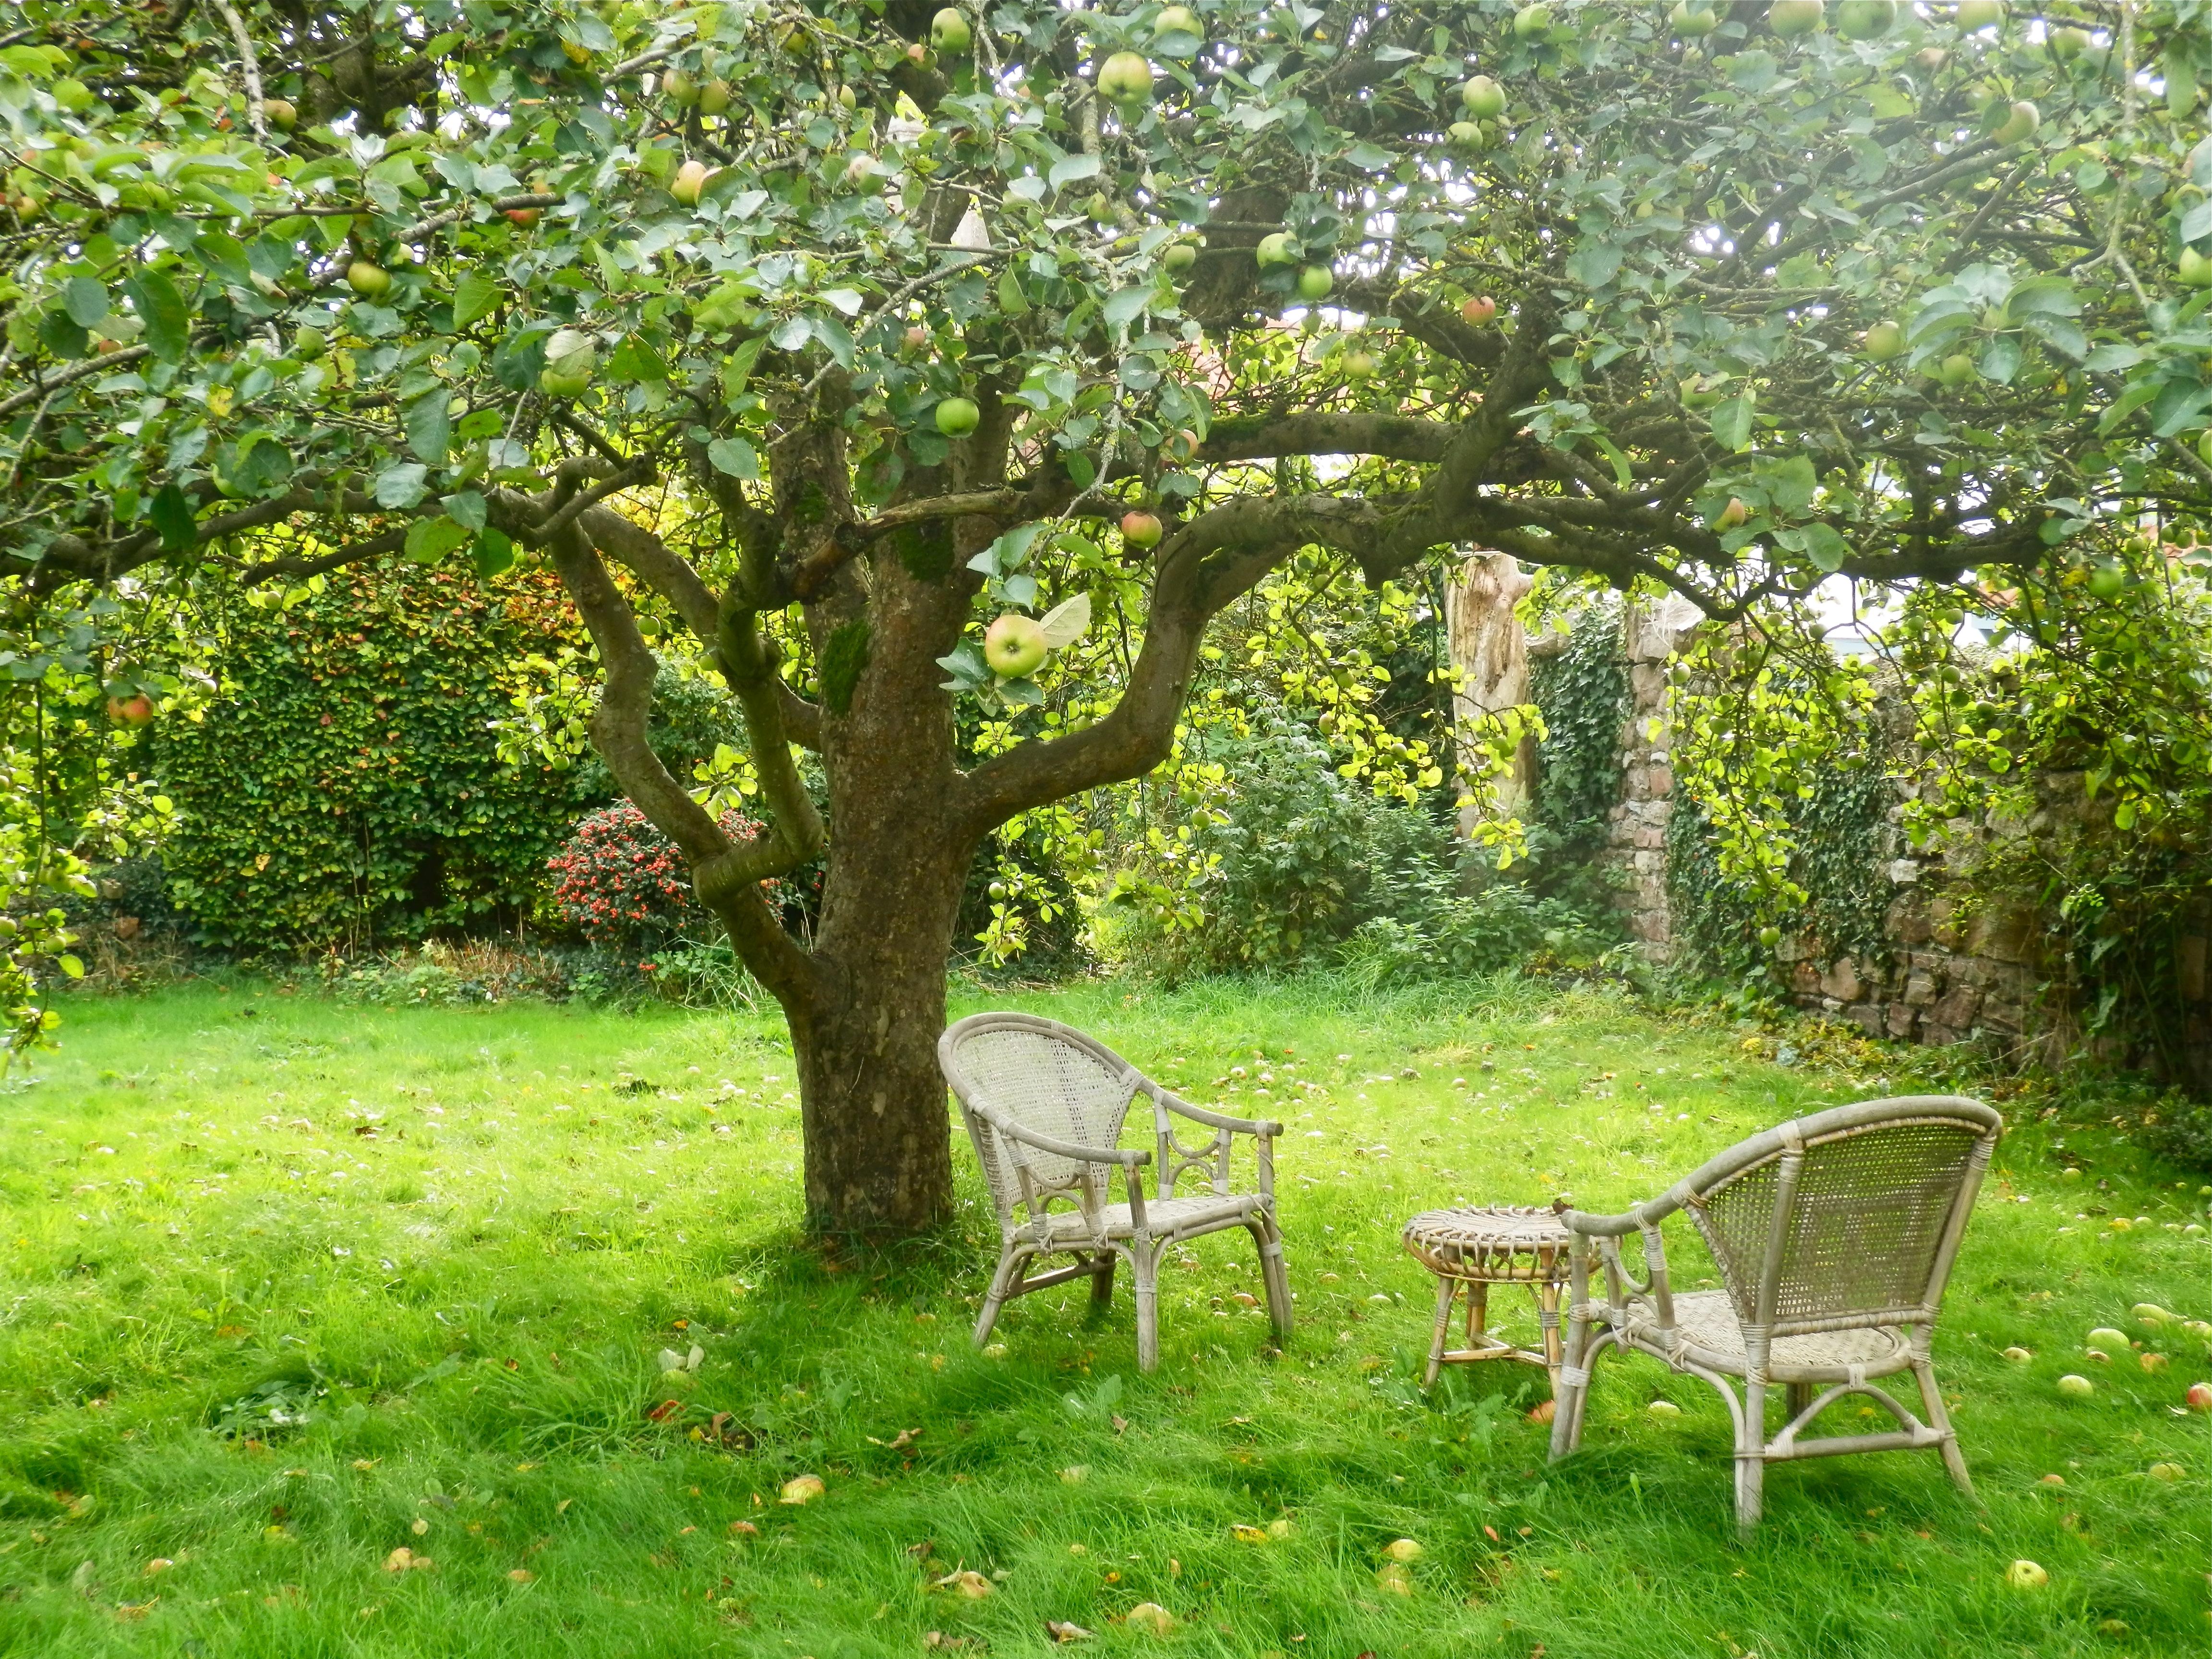 2,000+ Free Apple Tree & Apple Images - Pixabay